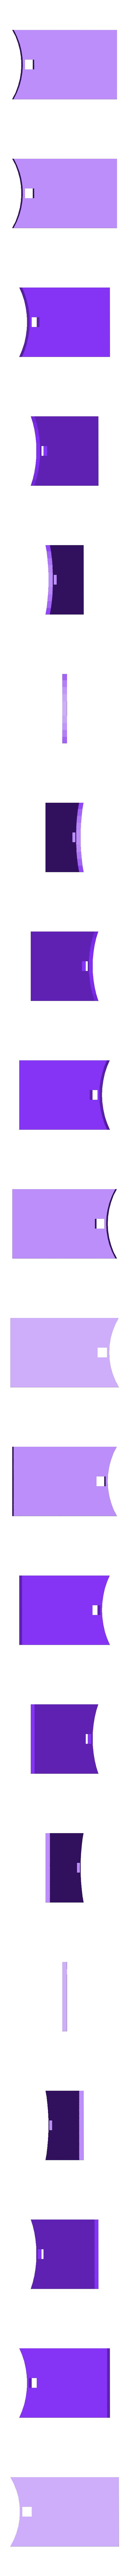 Spill_Plate.stl Download free STL file Archimedes Screw Bonanza • 3D printer design, Urulysman